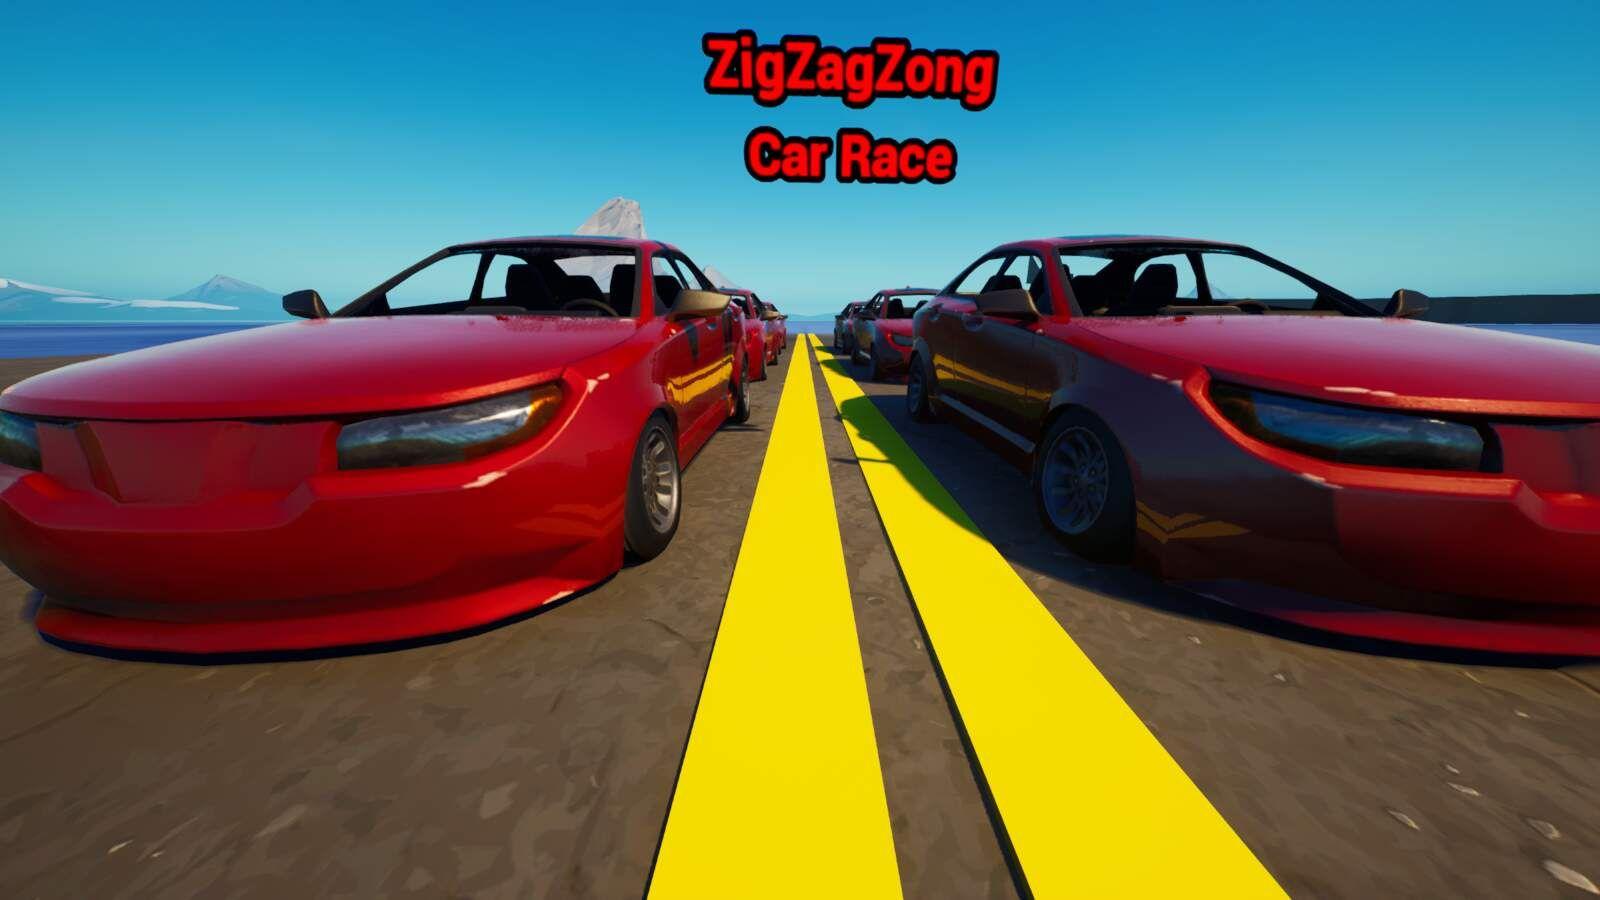 ✔️🚘ZigZagZong Car Race🚘✔️ 3417-5493-5083 by zigi